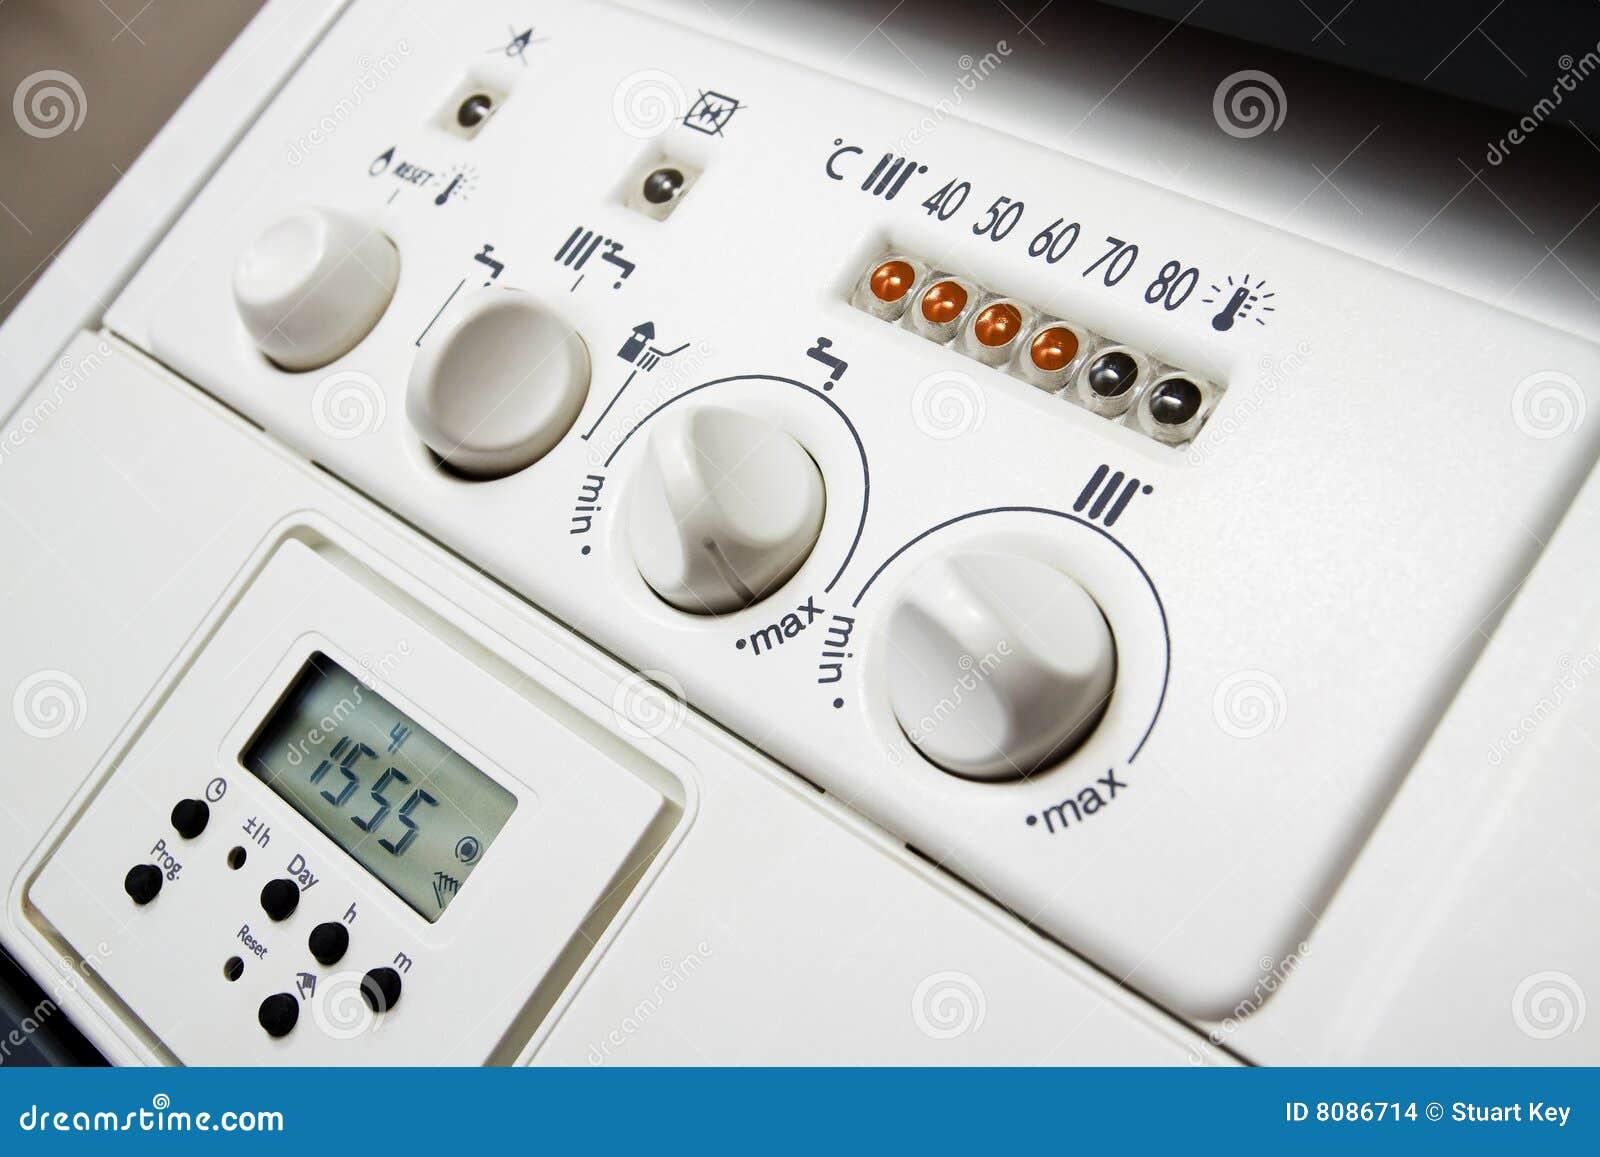 Central Heating Boiler Panel Stock Photo - Image of dial, boiler ...